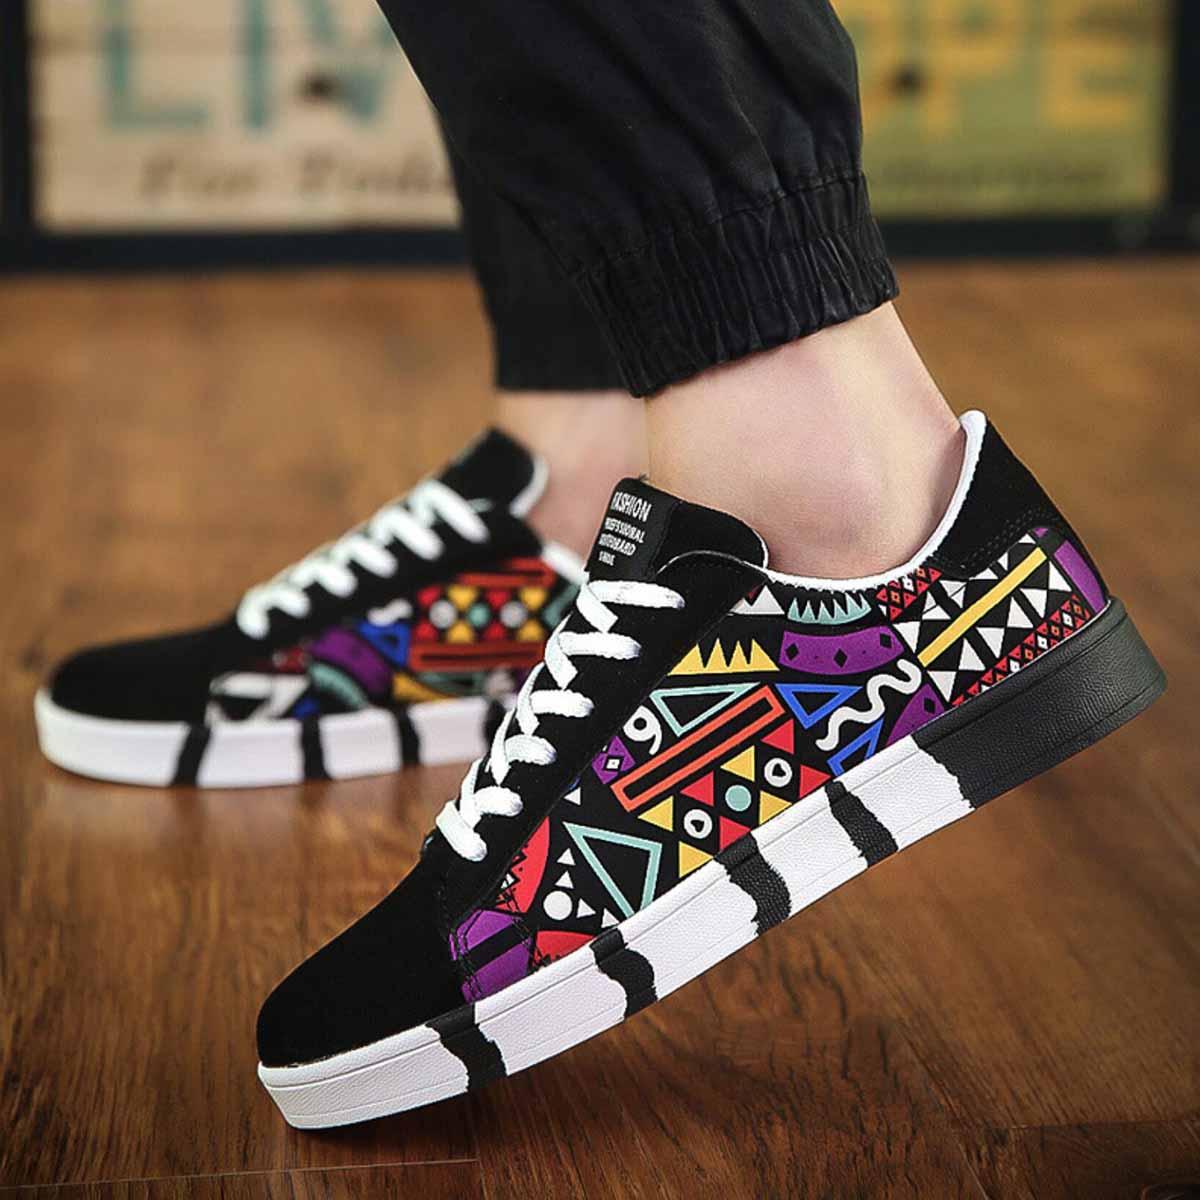 Men Fashion Graffiti Shallow Canvas Sneakers Casual Lace Up Vulcanized  Platform Shoe Hip-Hop Breathable Runway Shoes 59fef2c79